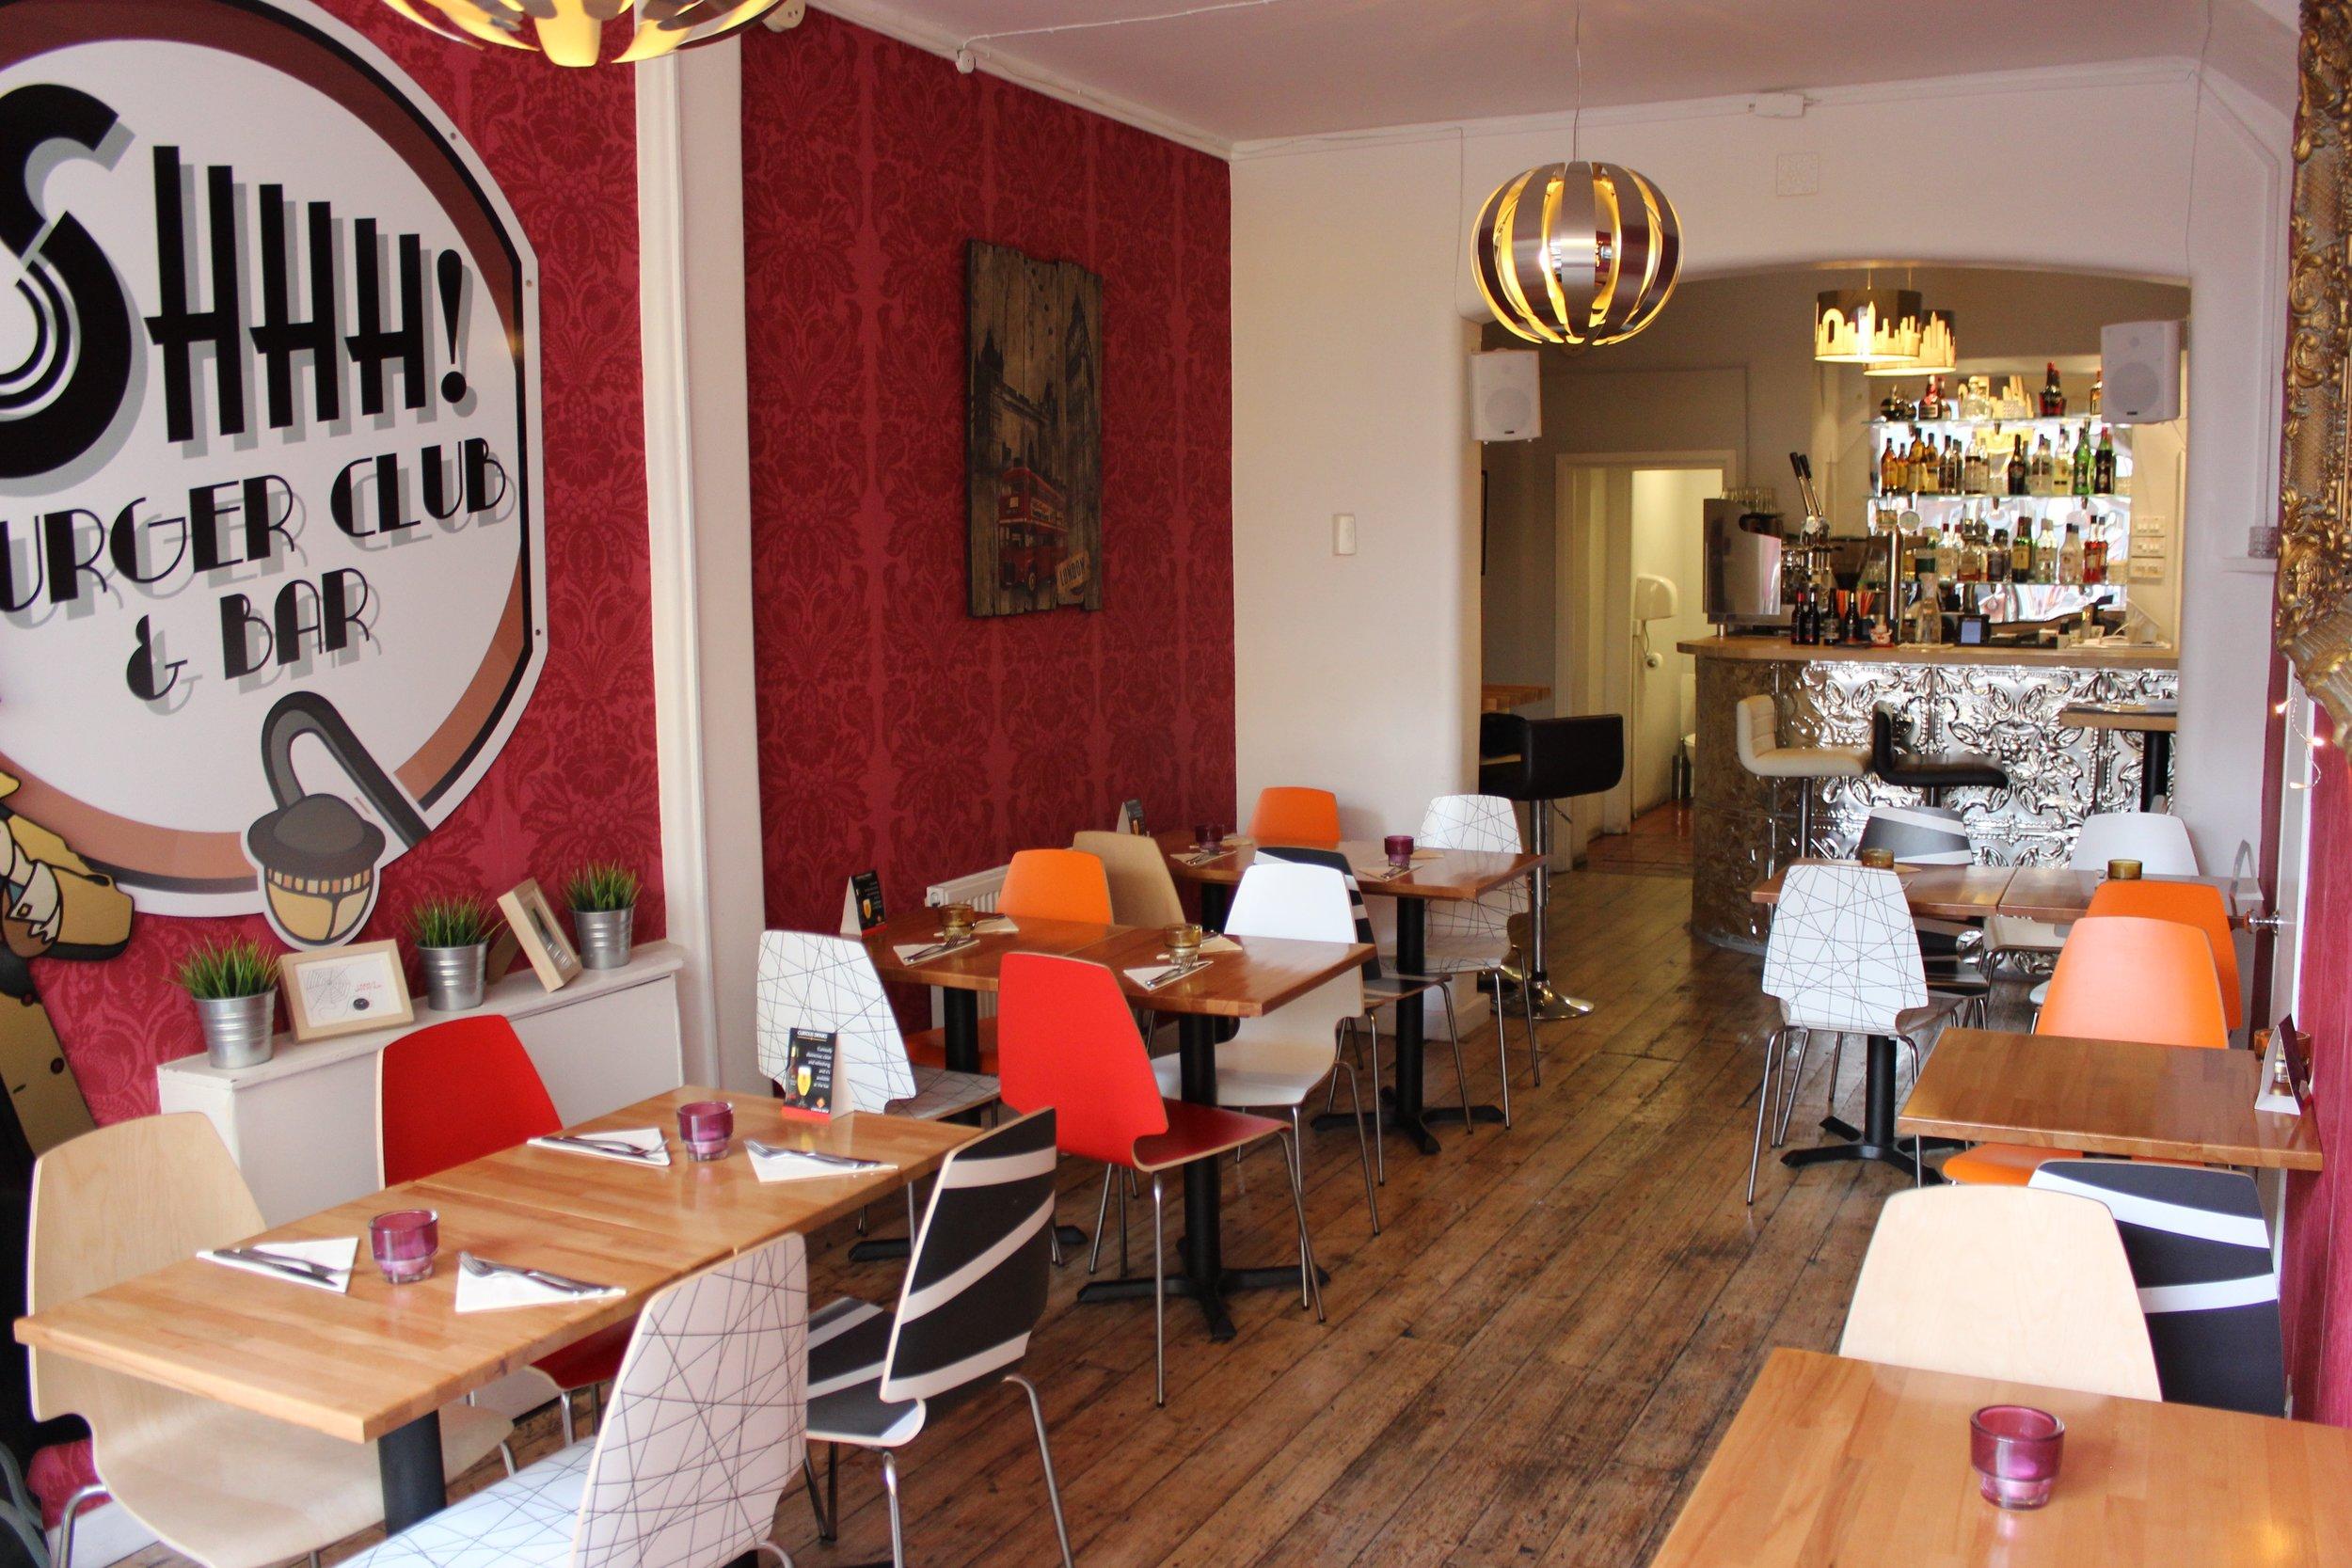 Shhh Burger Club & Bar Burger Restaurant in Brixton South London Club 5.jpg